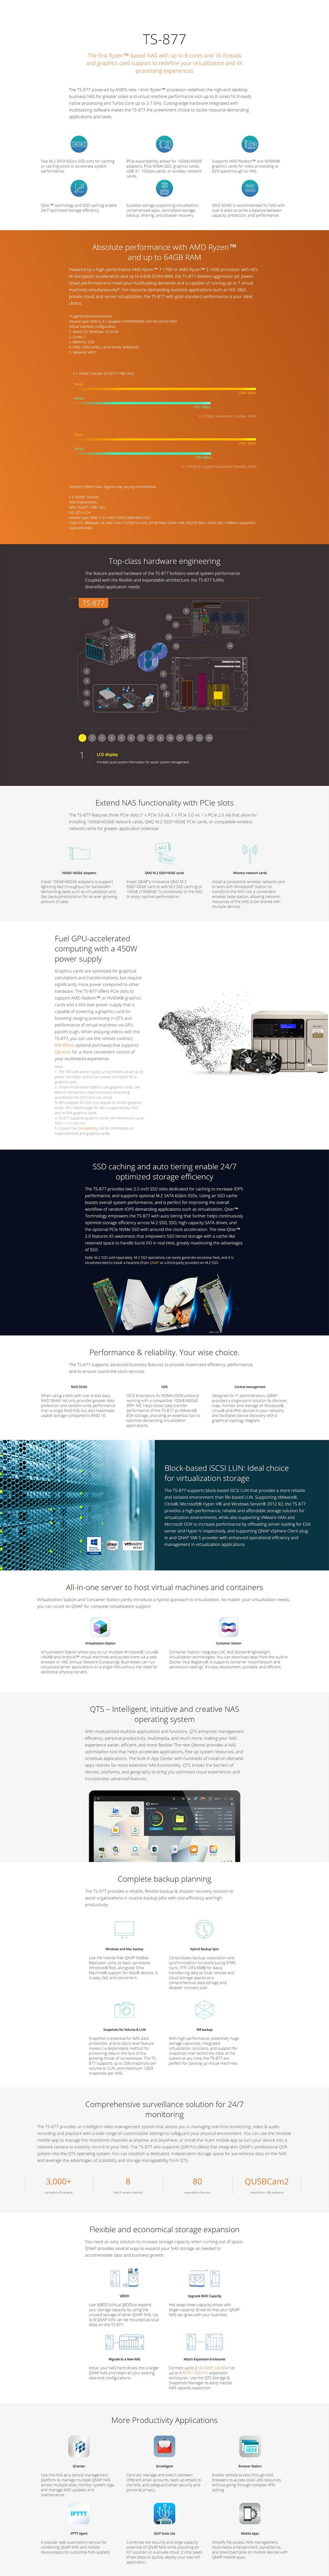 QNAP TS-877-1700-16G 8-Bay Diskless NAS - AMD Ryzen 7 1700 8-Core CPU 16GB - Desktop Overview 1